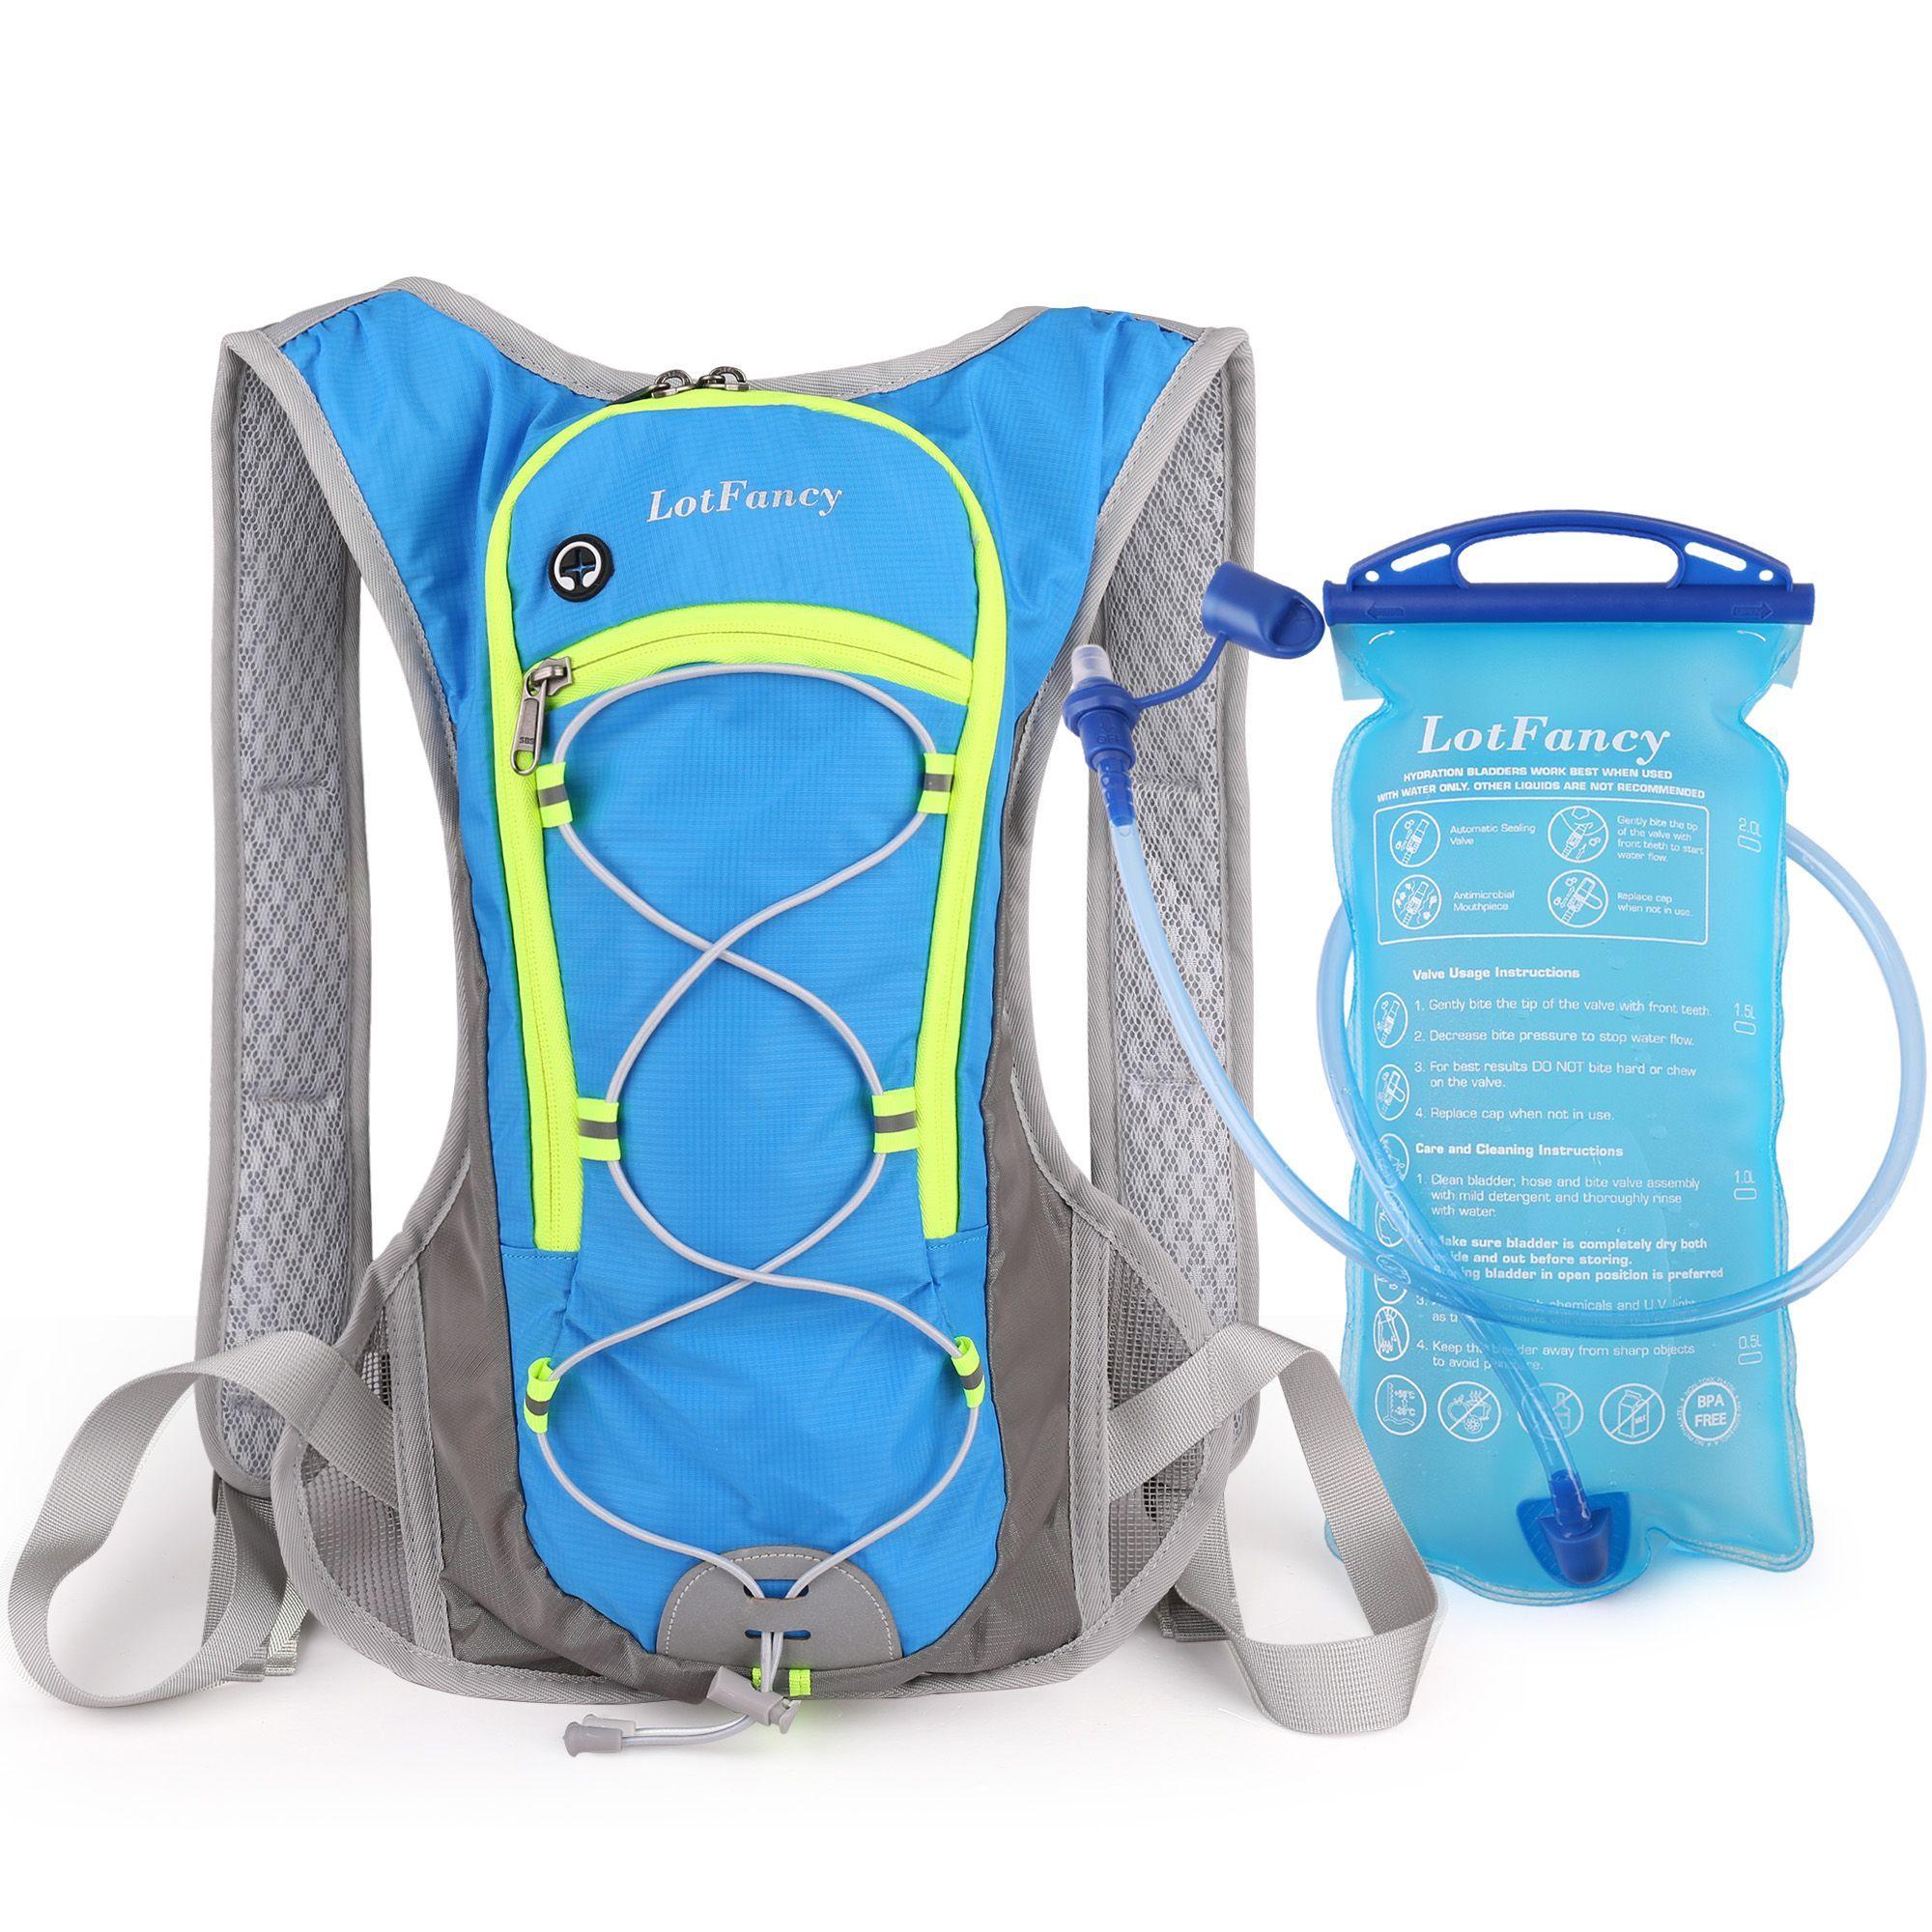 5X 2L Hydration Packs Water Bladder Bag Backpack Hiking Camping Reservoir Sports